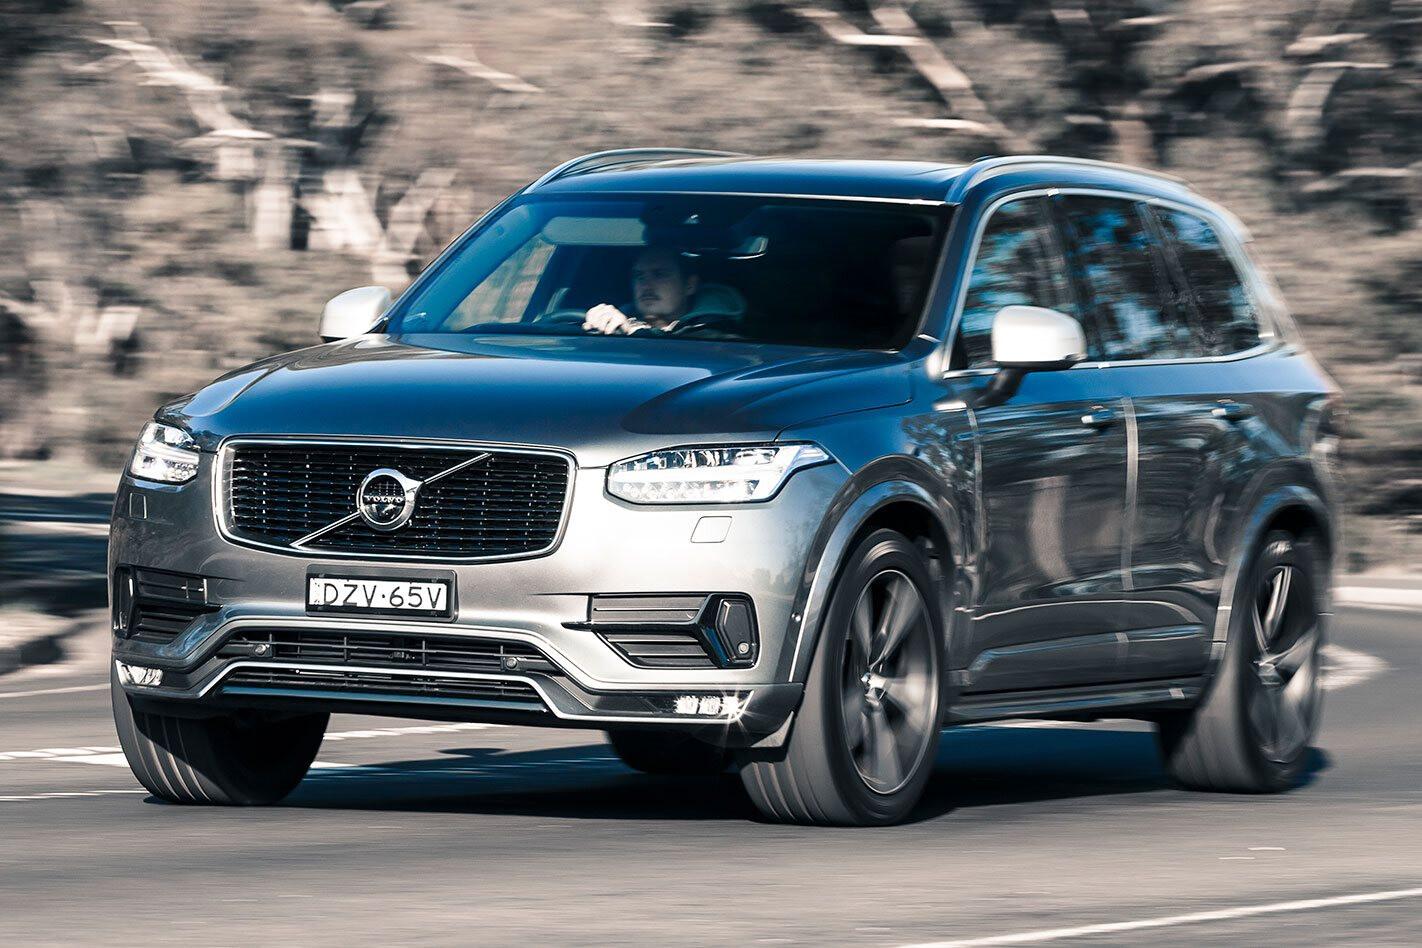 Volvo slashes prices of XC90 large SUV